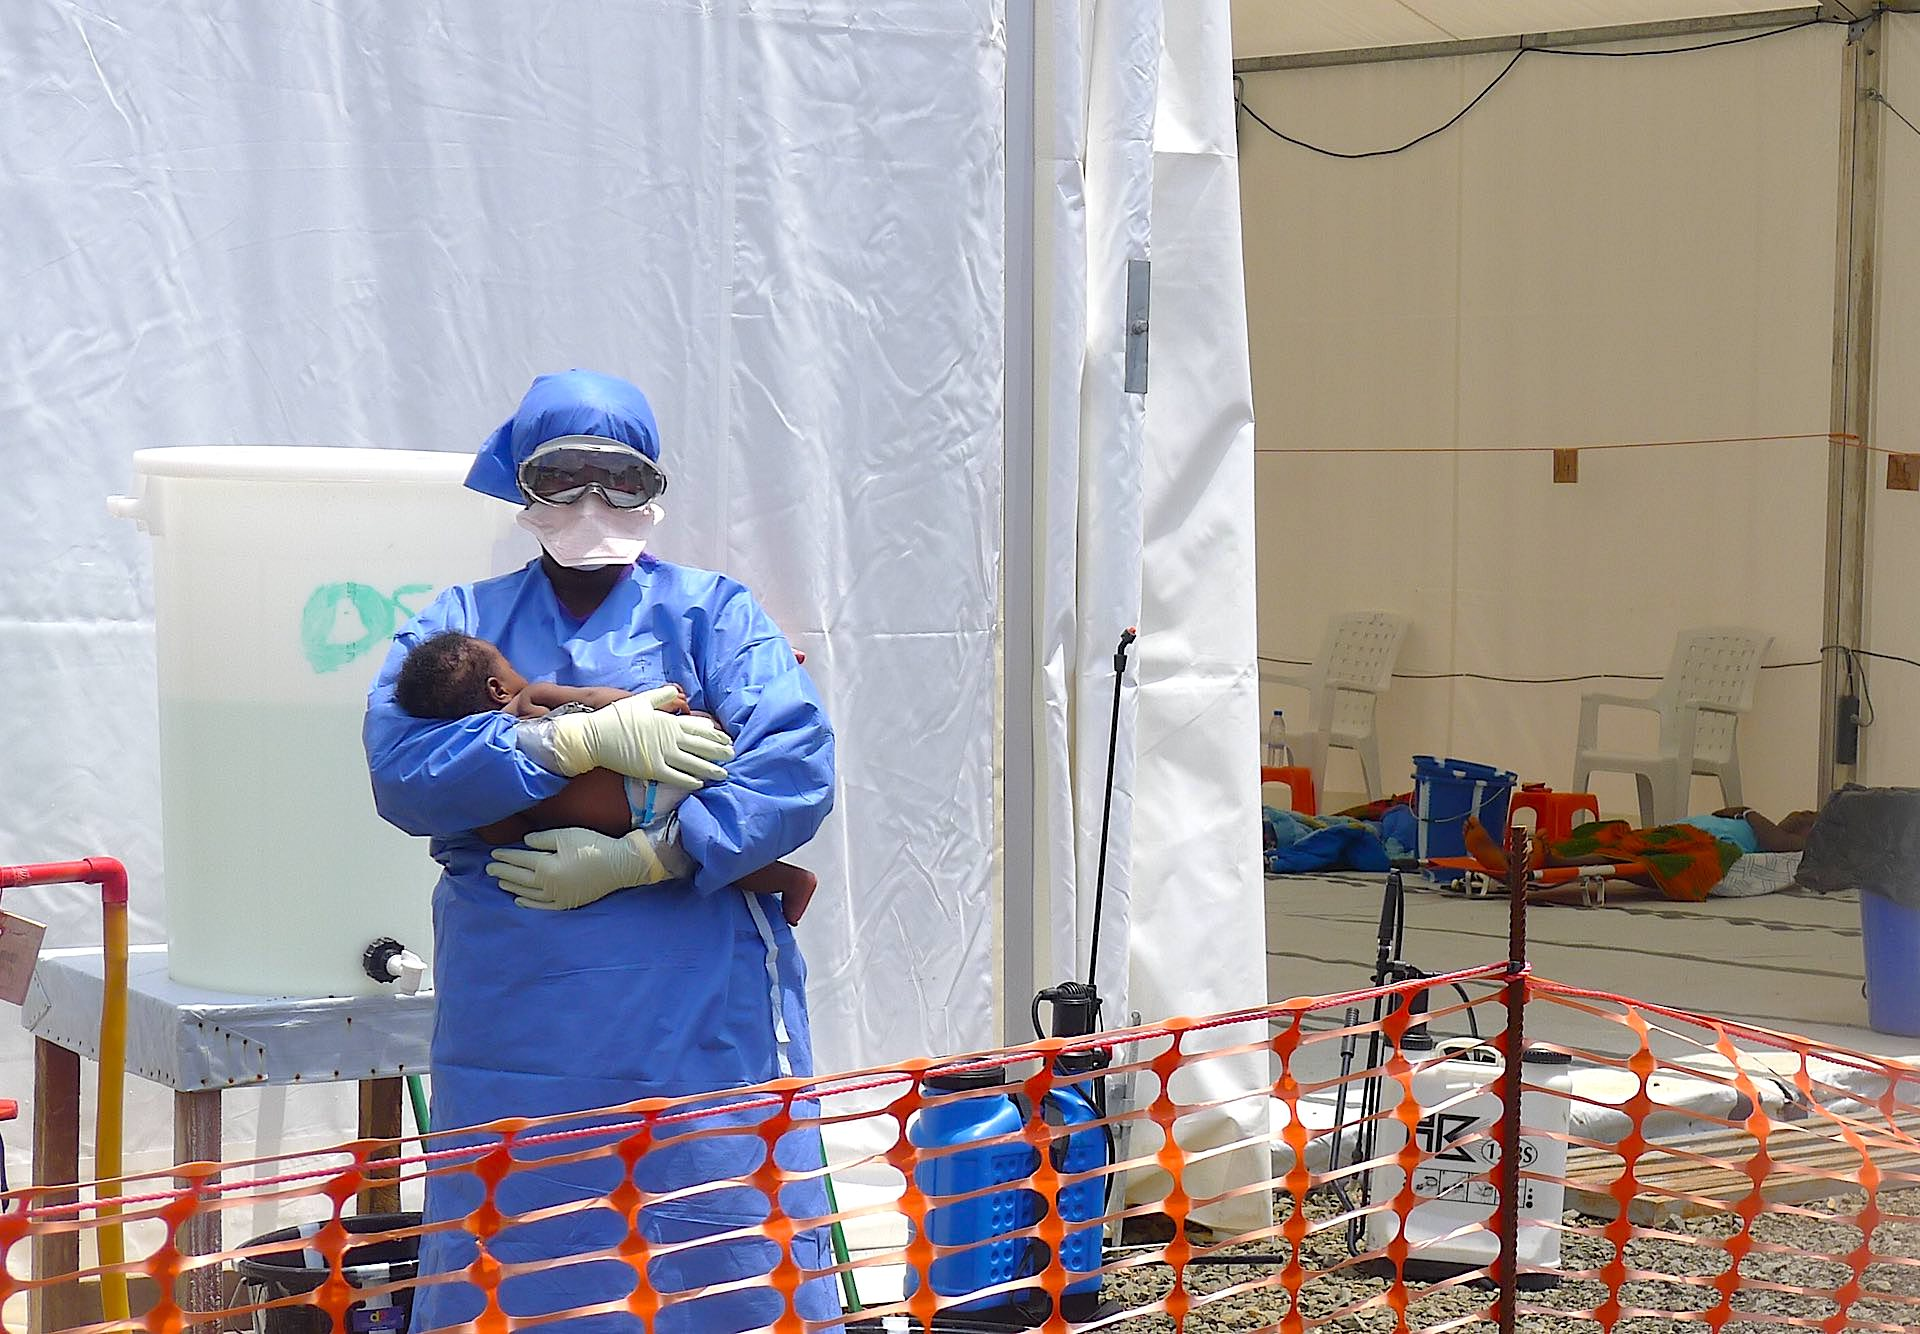 Liberia, Sierra Leone, Ebola, Salome Karwah, Time Magazine, Partners In Health, World Health Organization, WHO, KOLUMN Magazine, KOLUMN